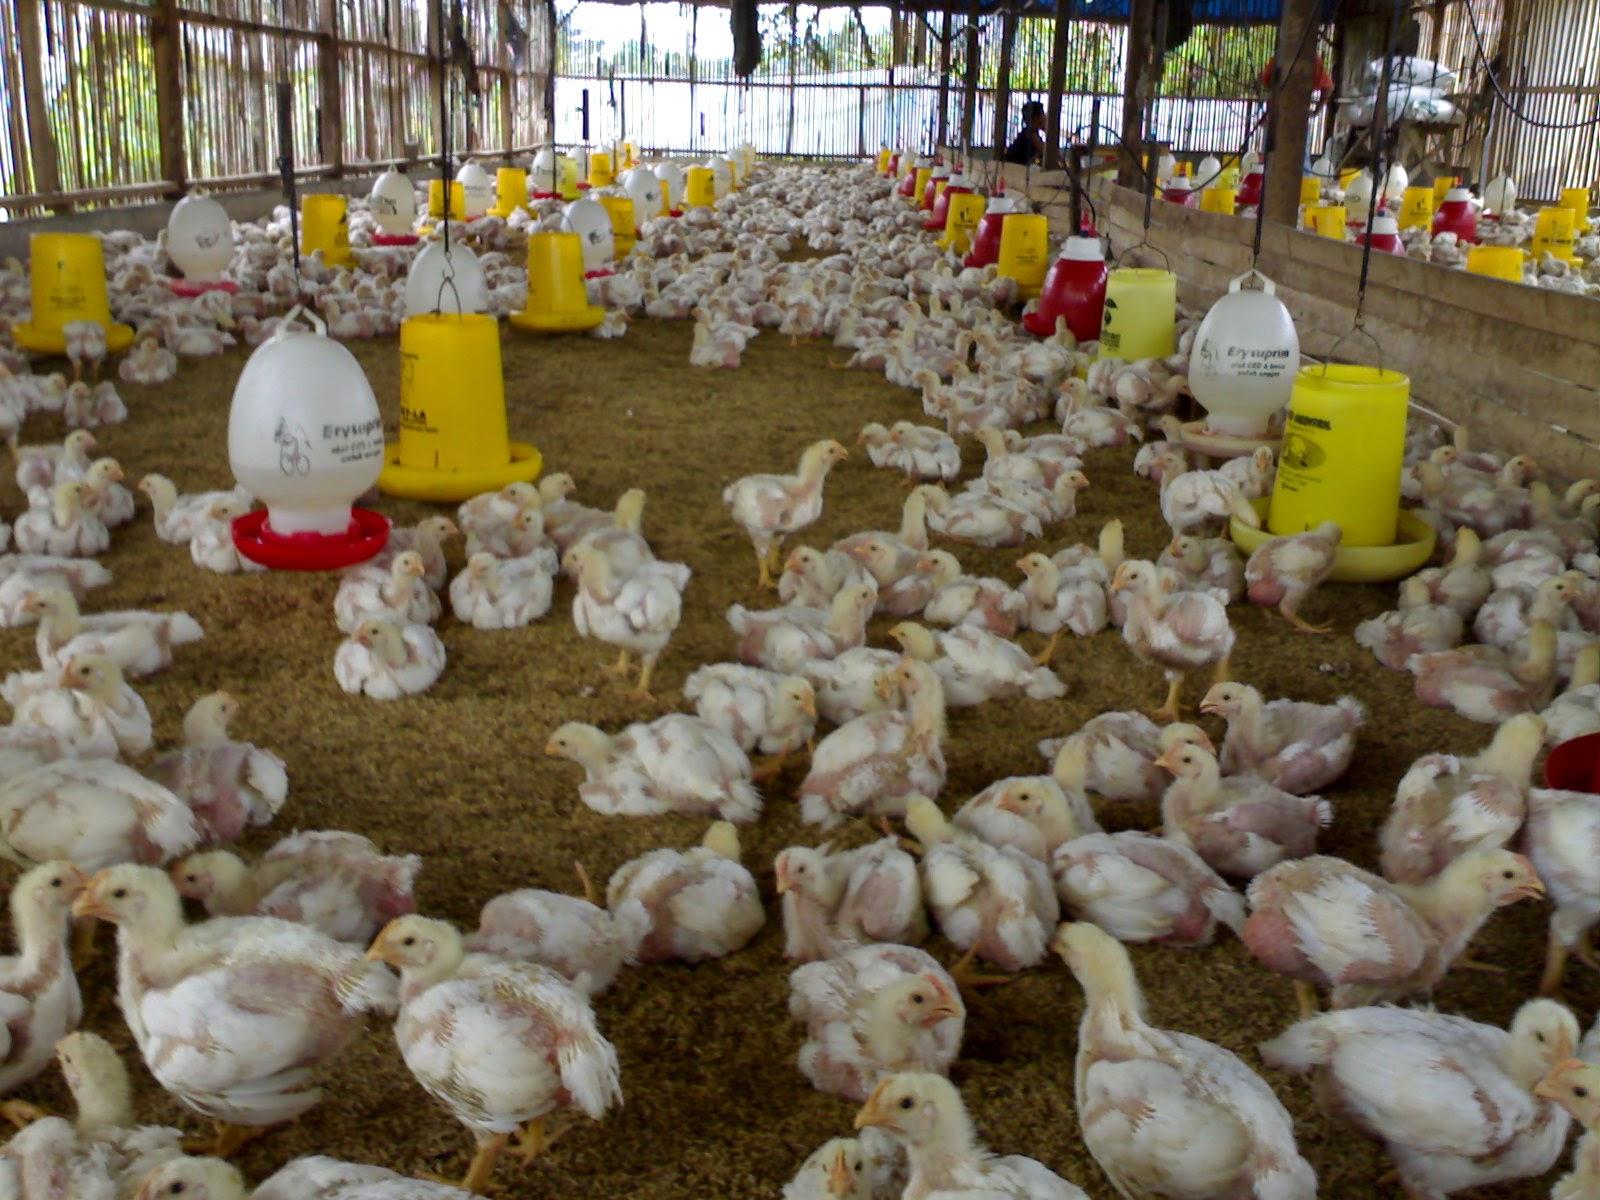 Go-Livestock: Laporan Praktikum Manajemen Ternak Unggas (MTU)